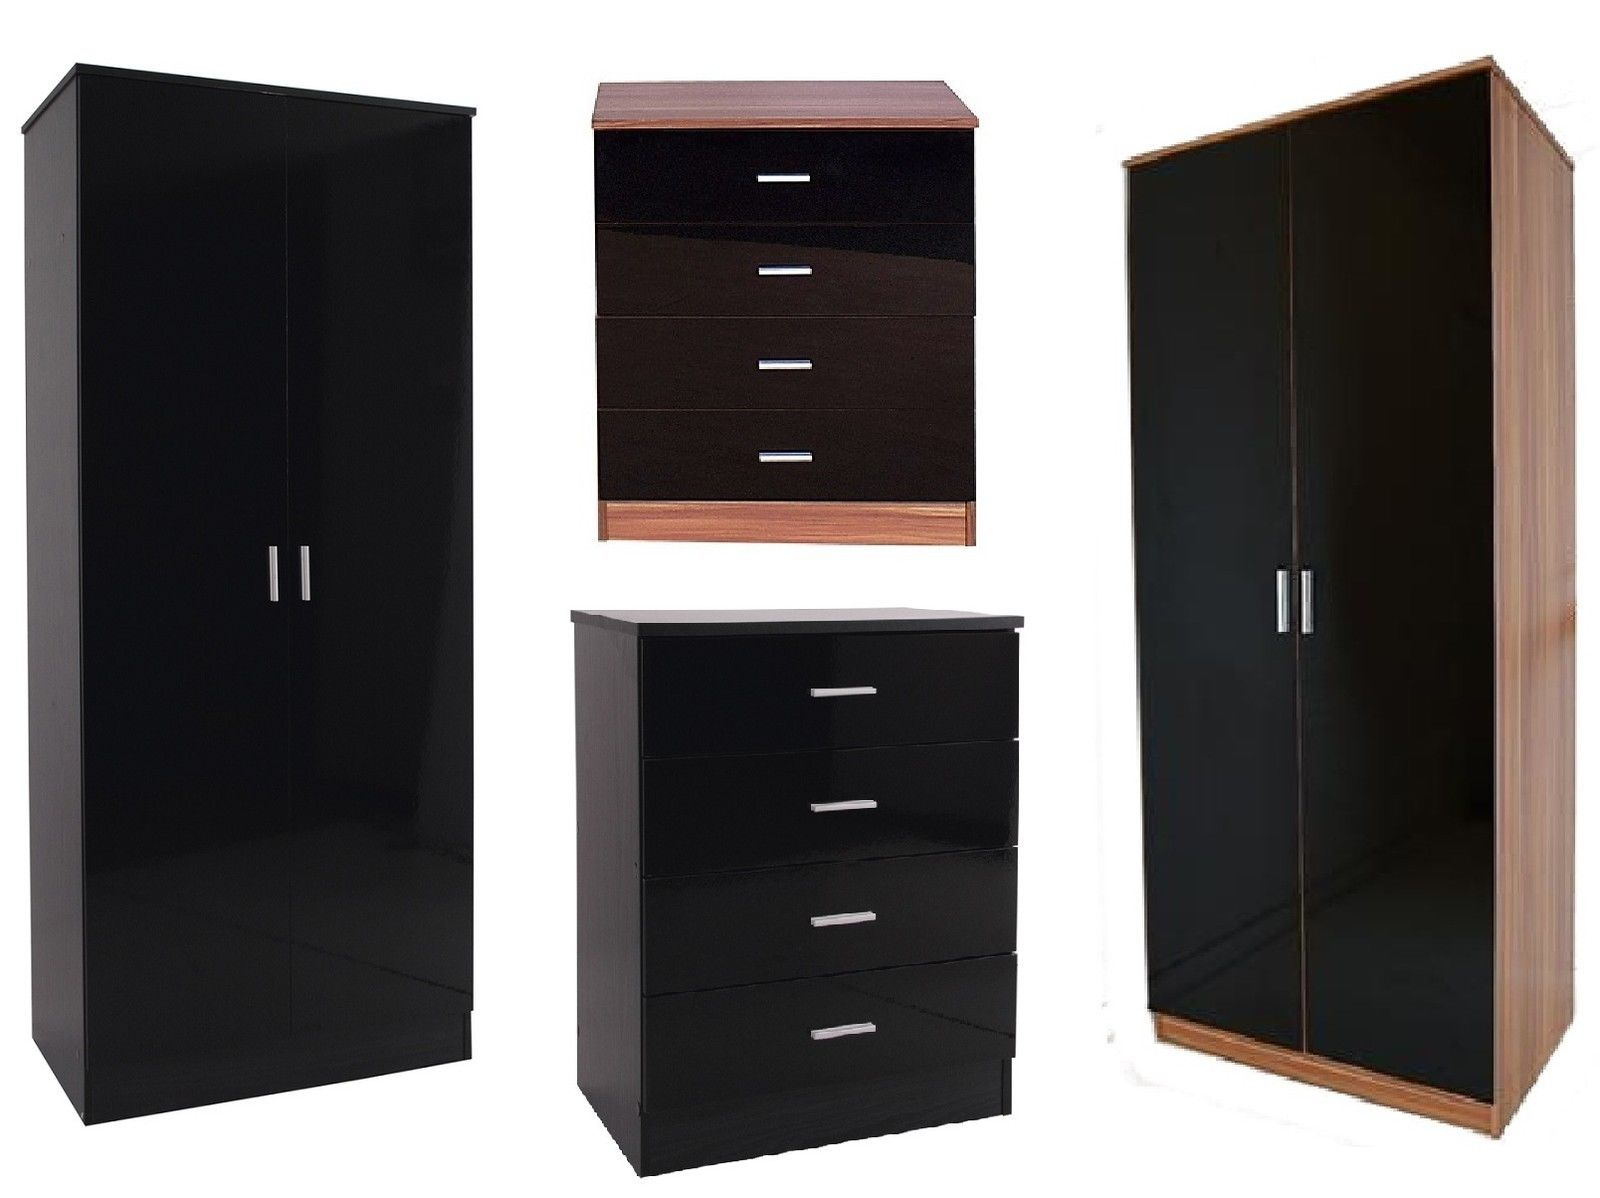 black high gloss bedroom furniture set wardrobe chest of drawers